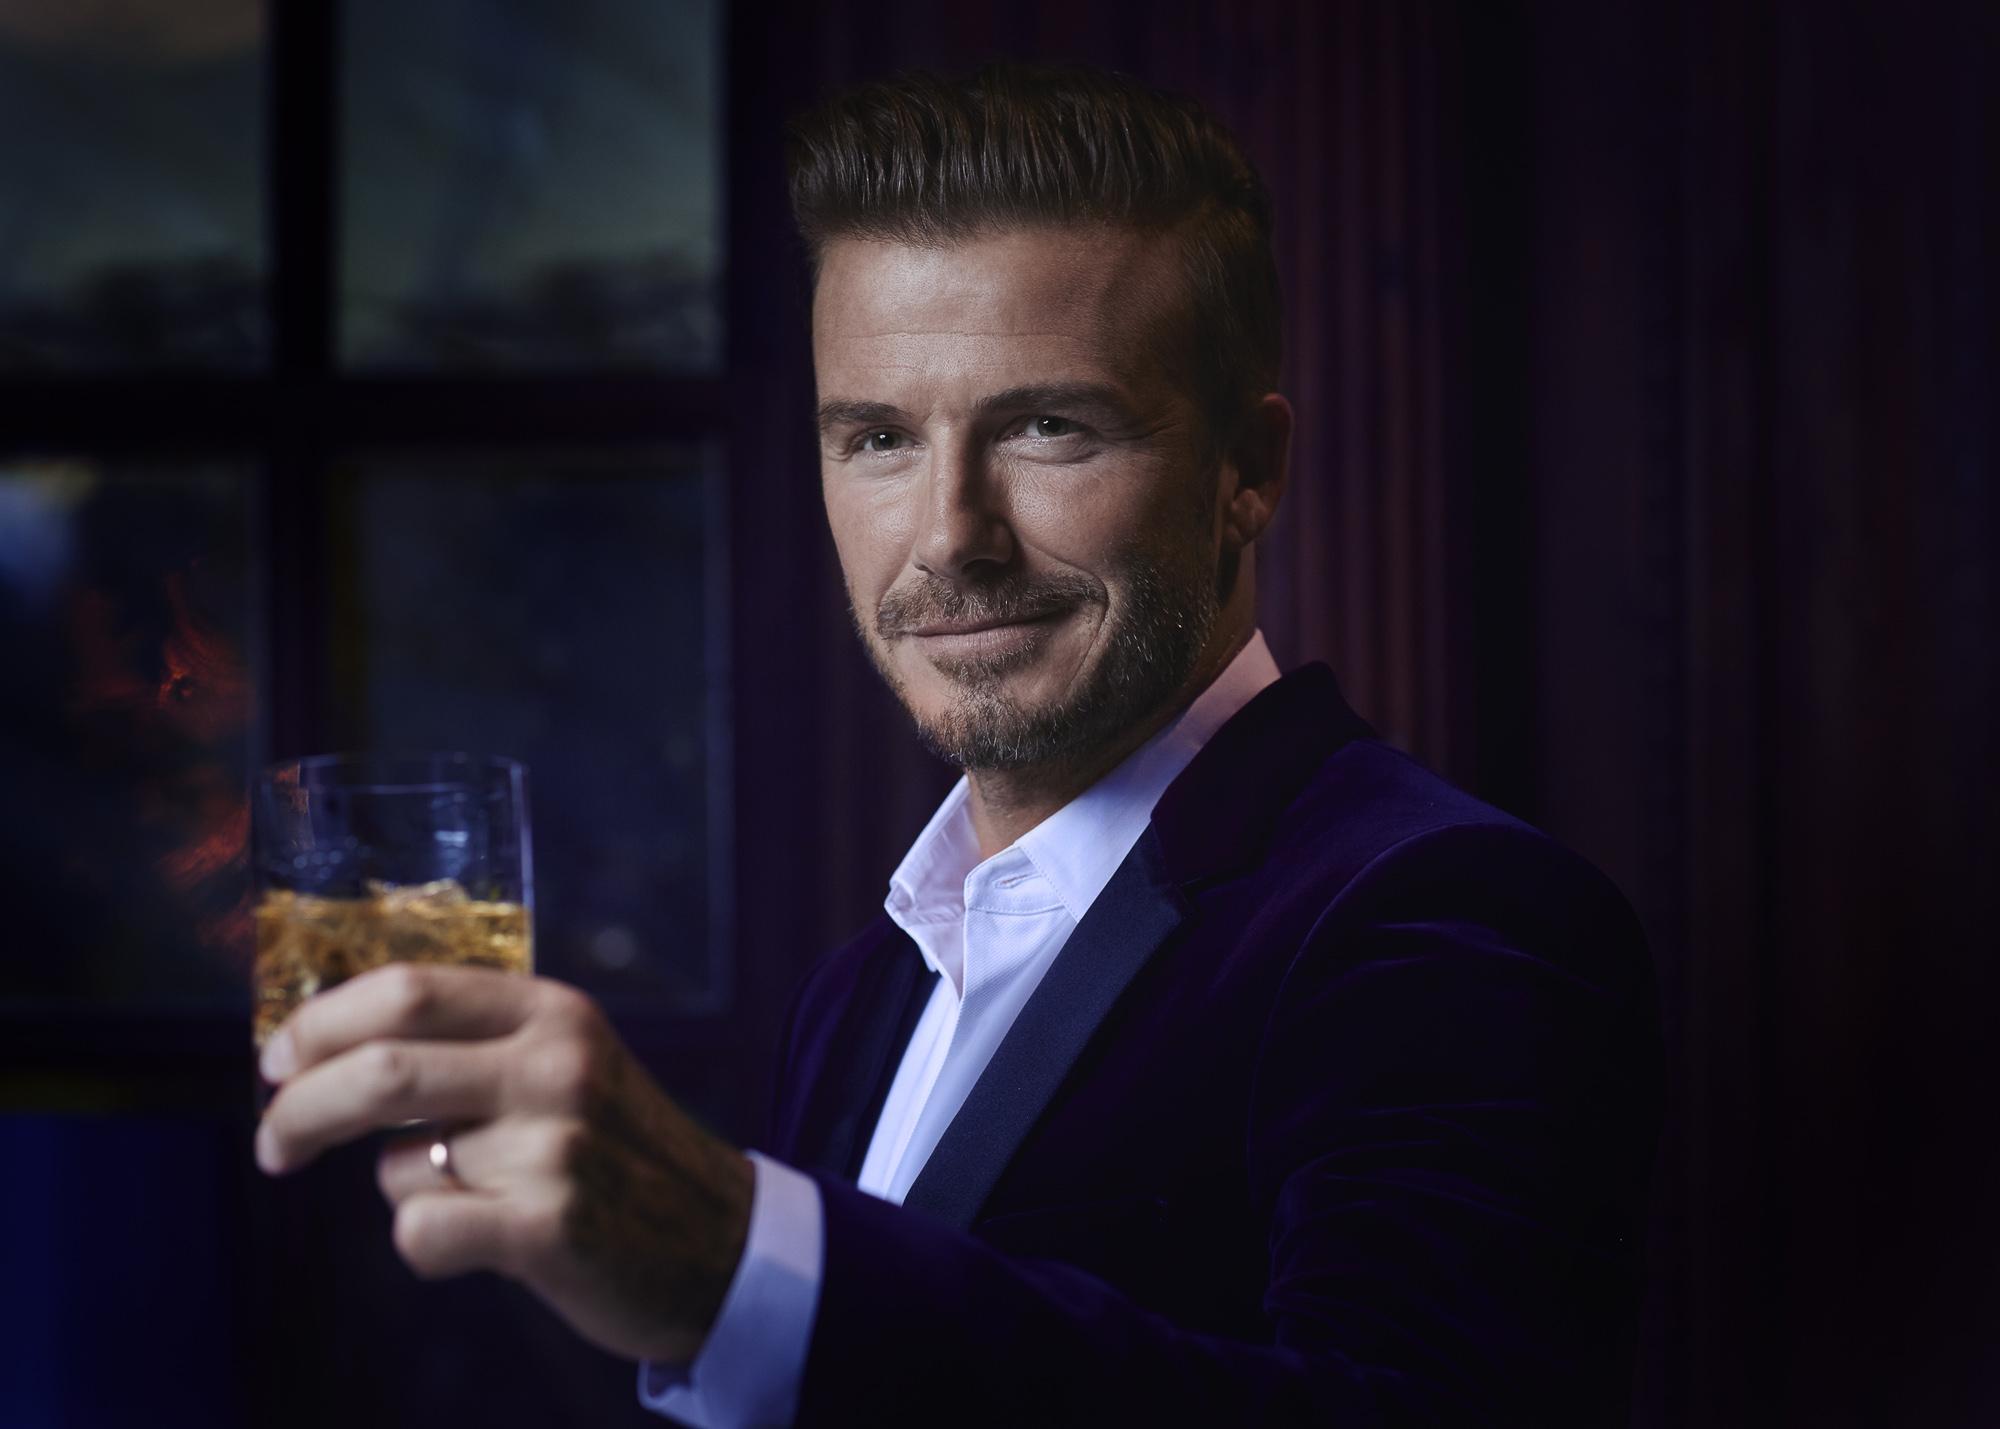 David beckham invites you to travel the world drinking his scotch meet the very stylish haig club m4hsunfo